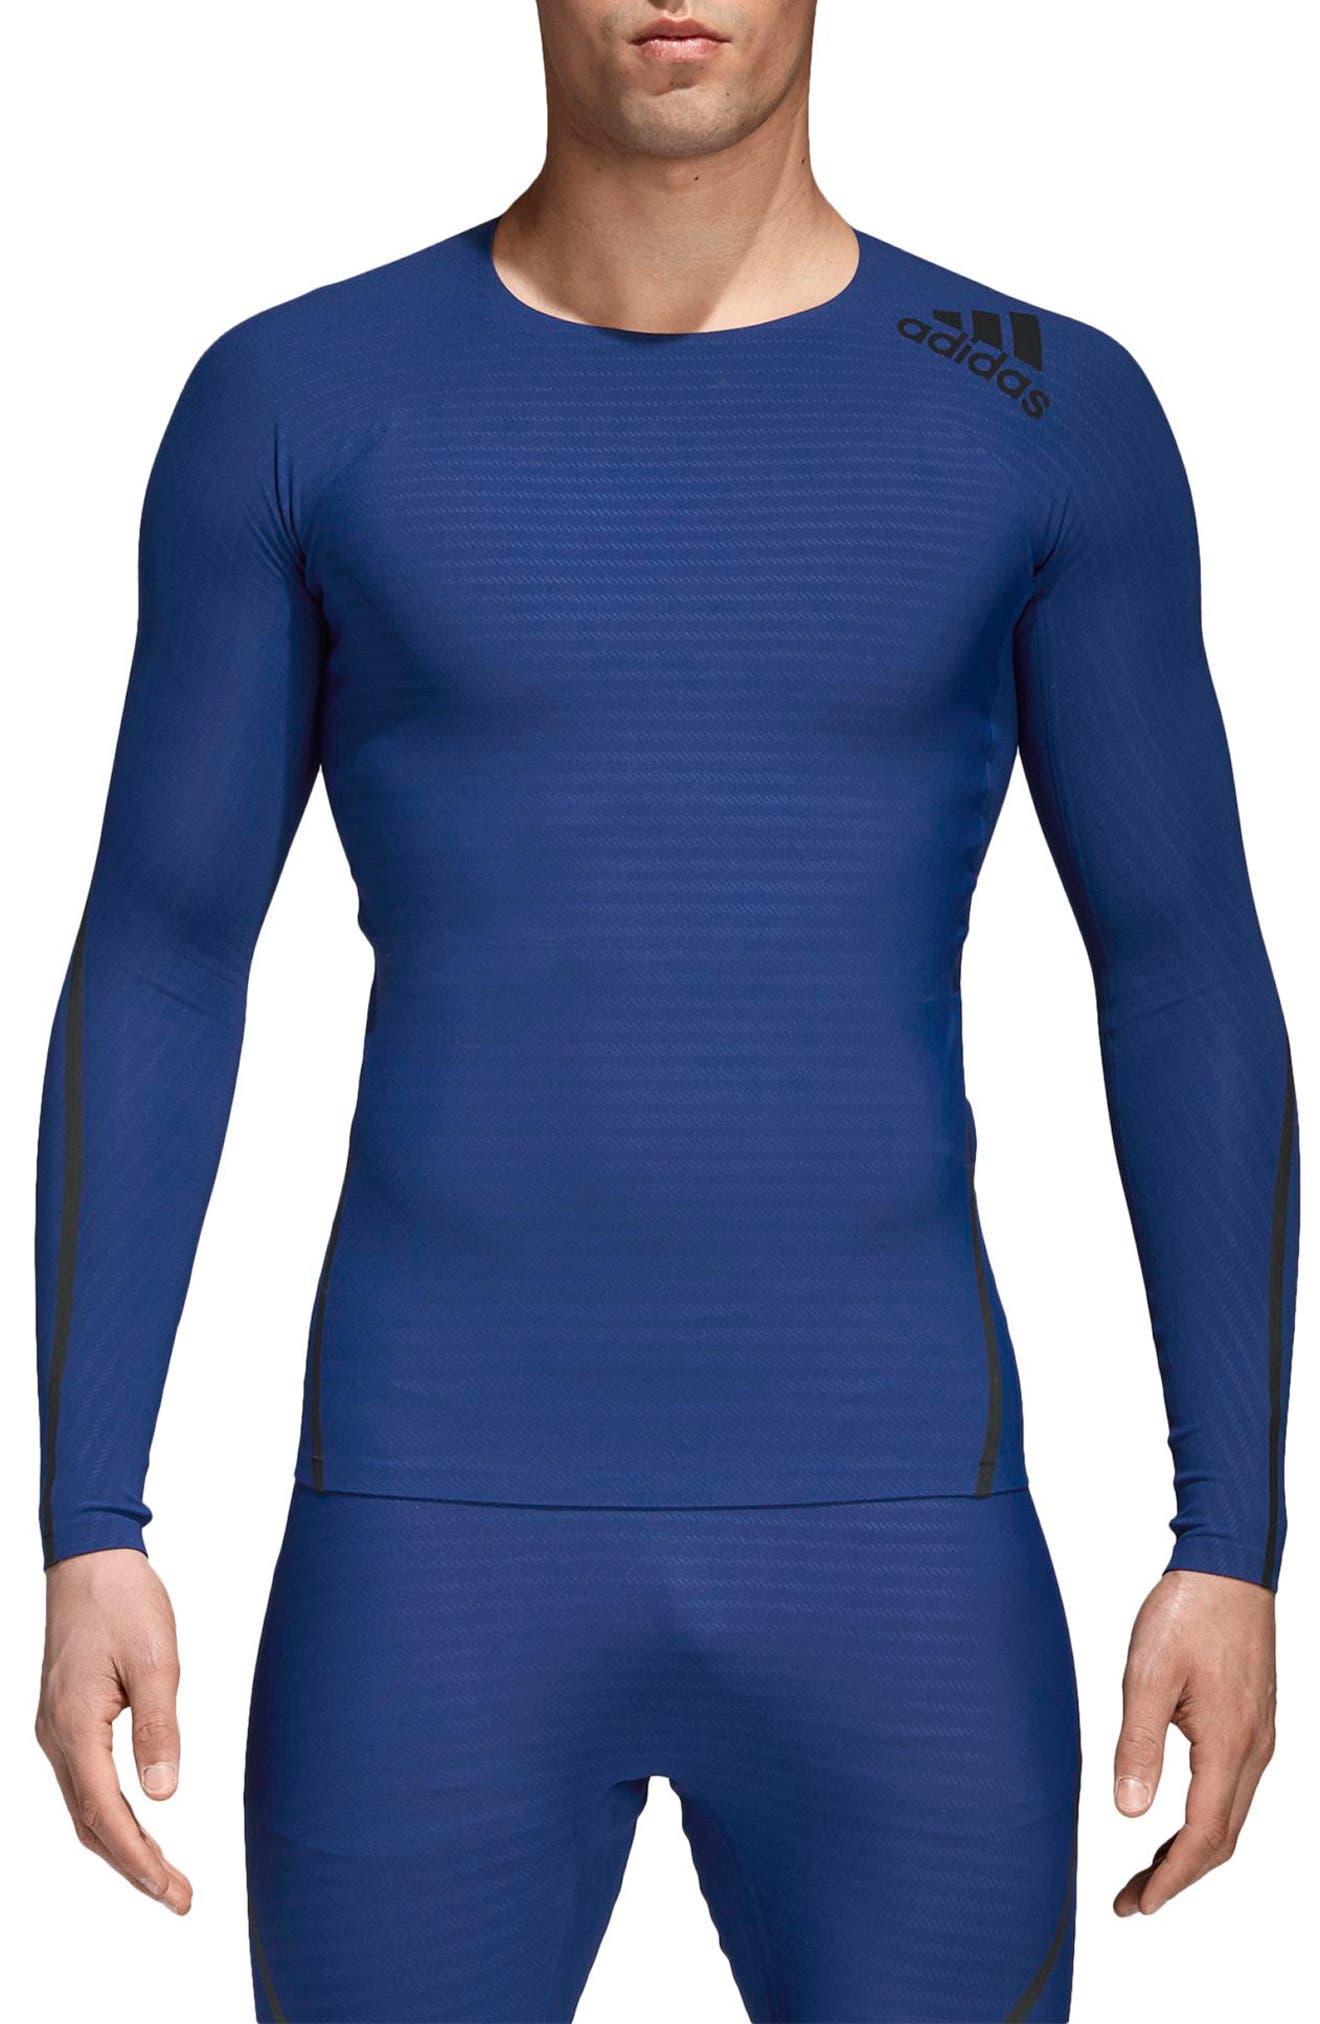 Alternate Image 1 Selected - adidas Alphaskin 360 Long Sleeve T-Shirt